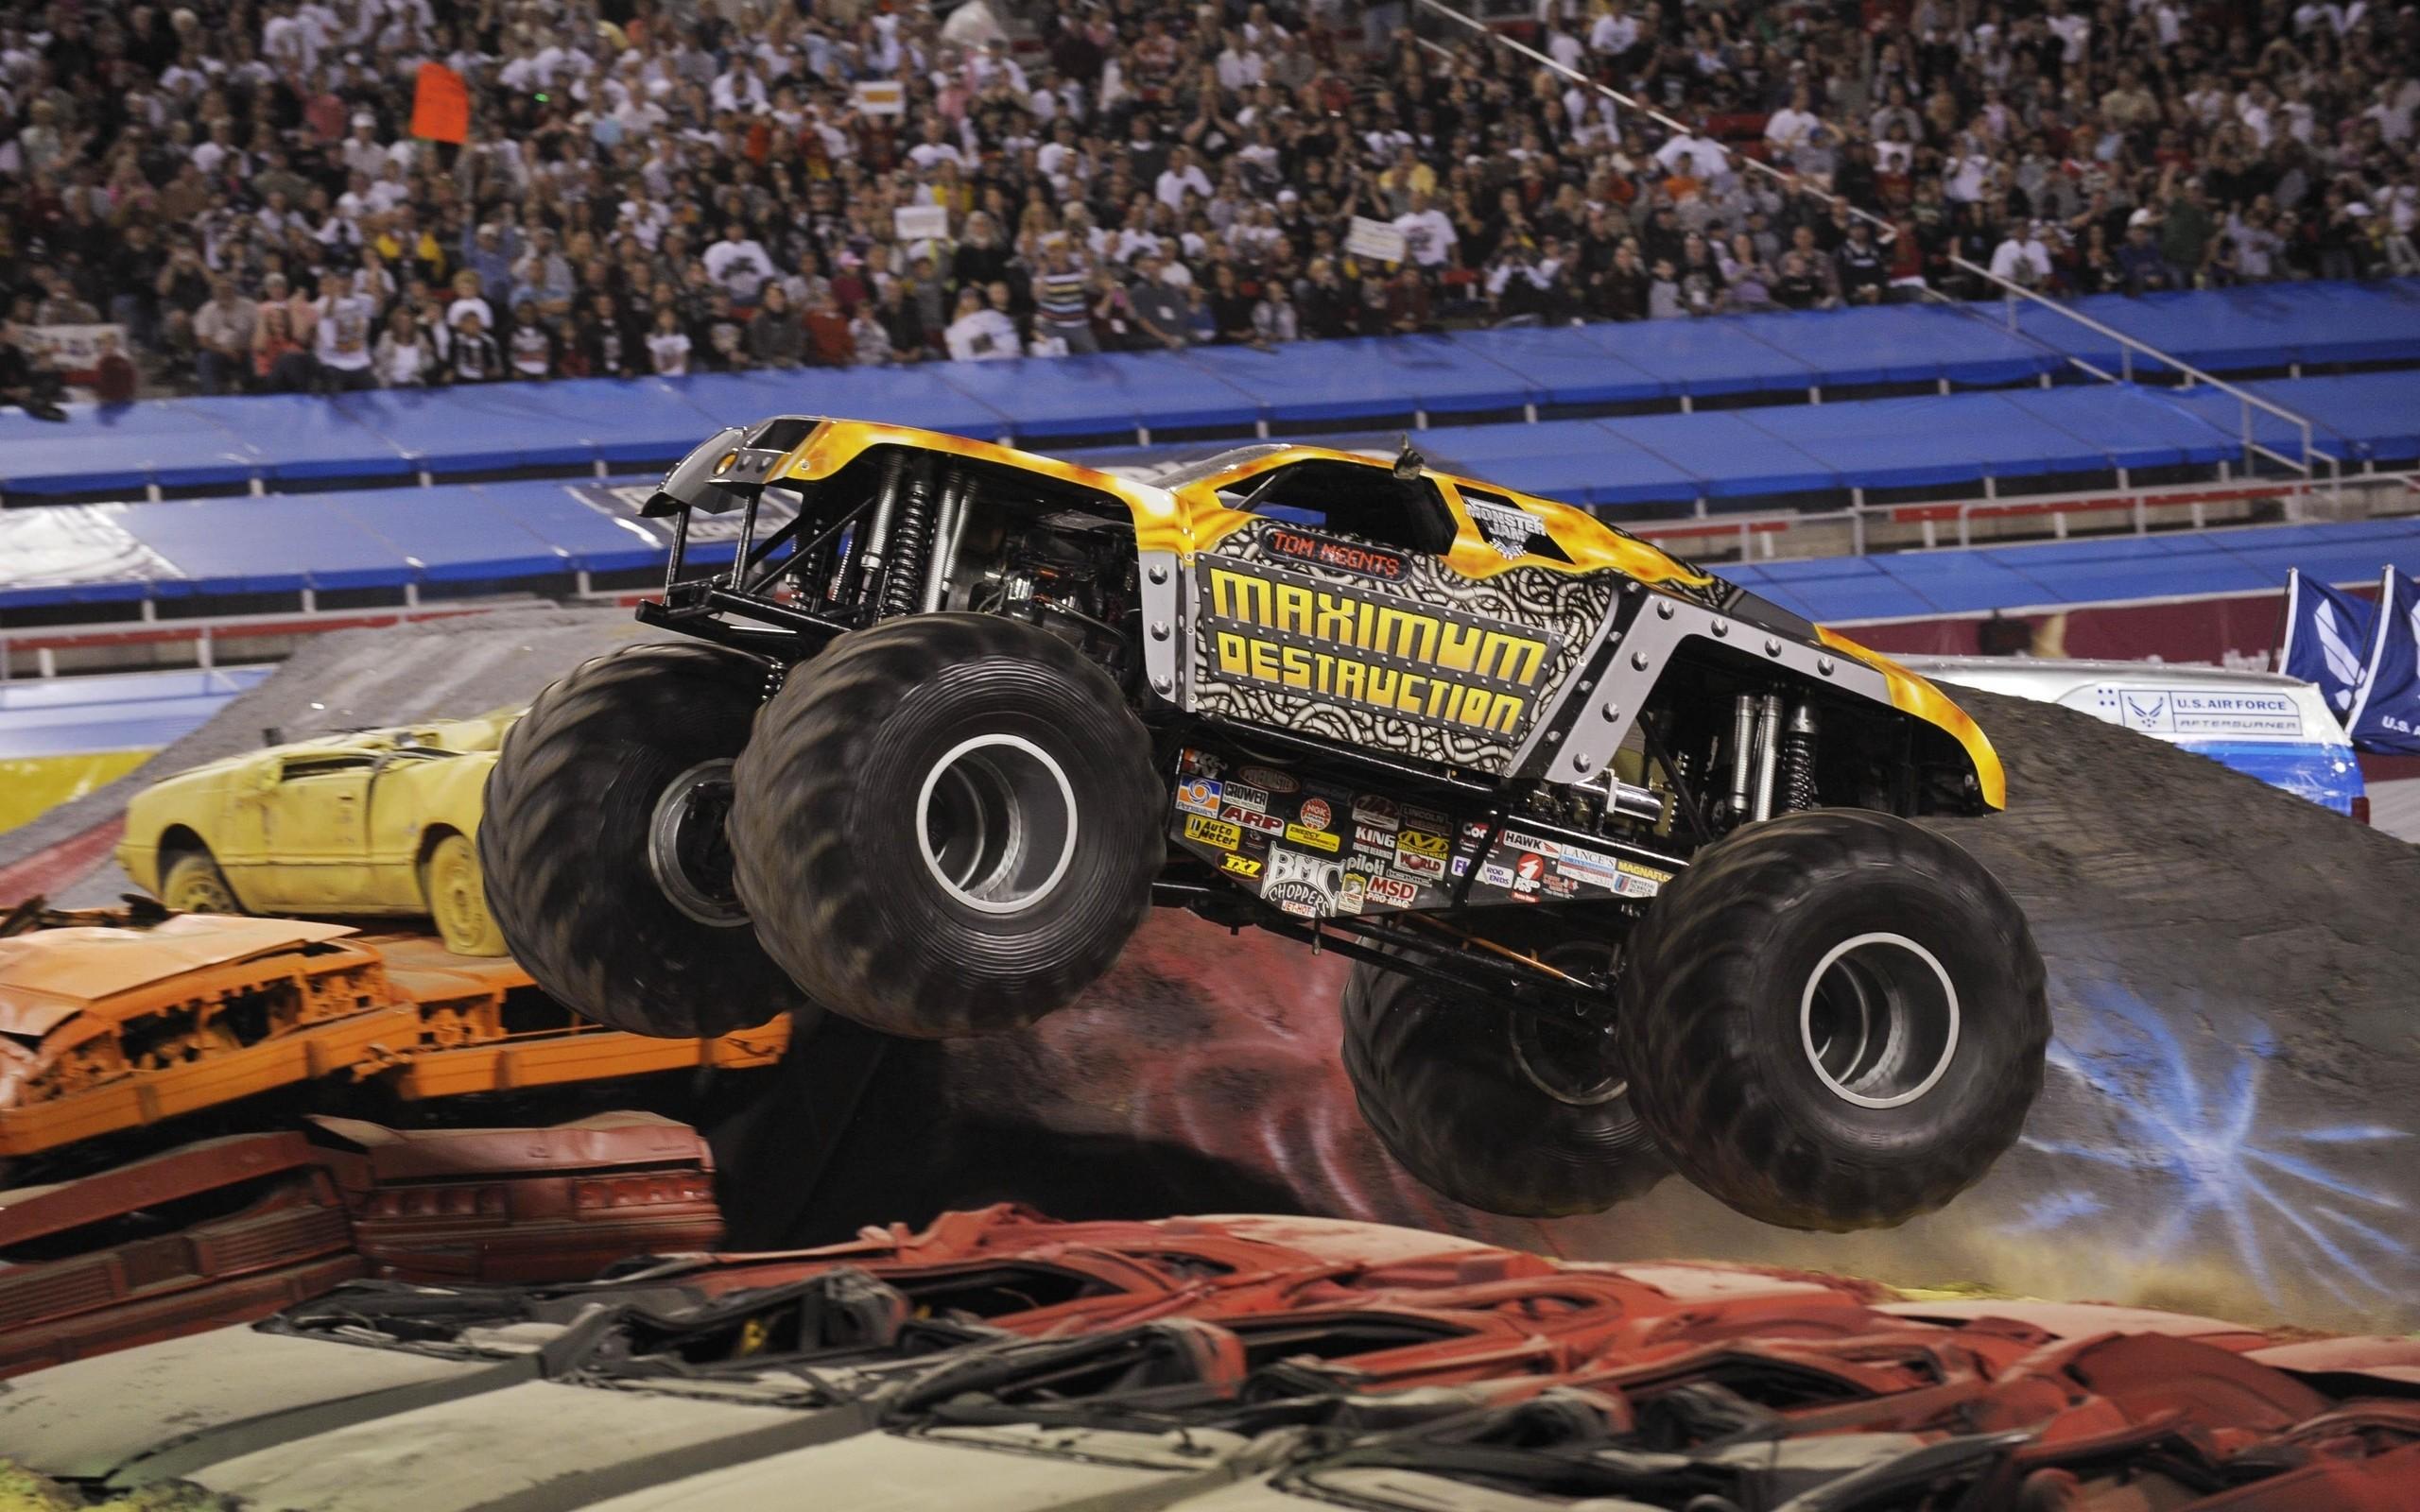 Res: 2560x1600, Monster Truck Wallpaper